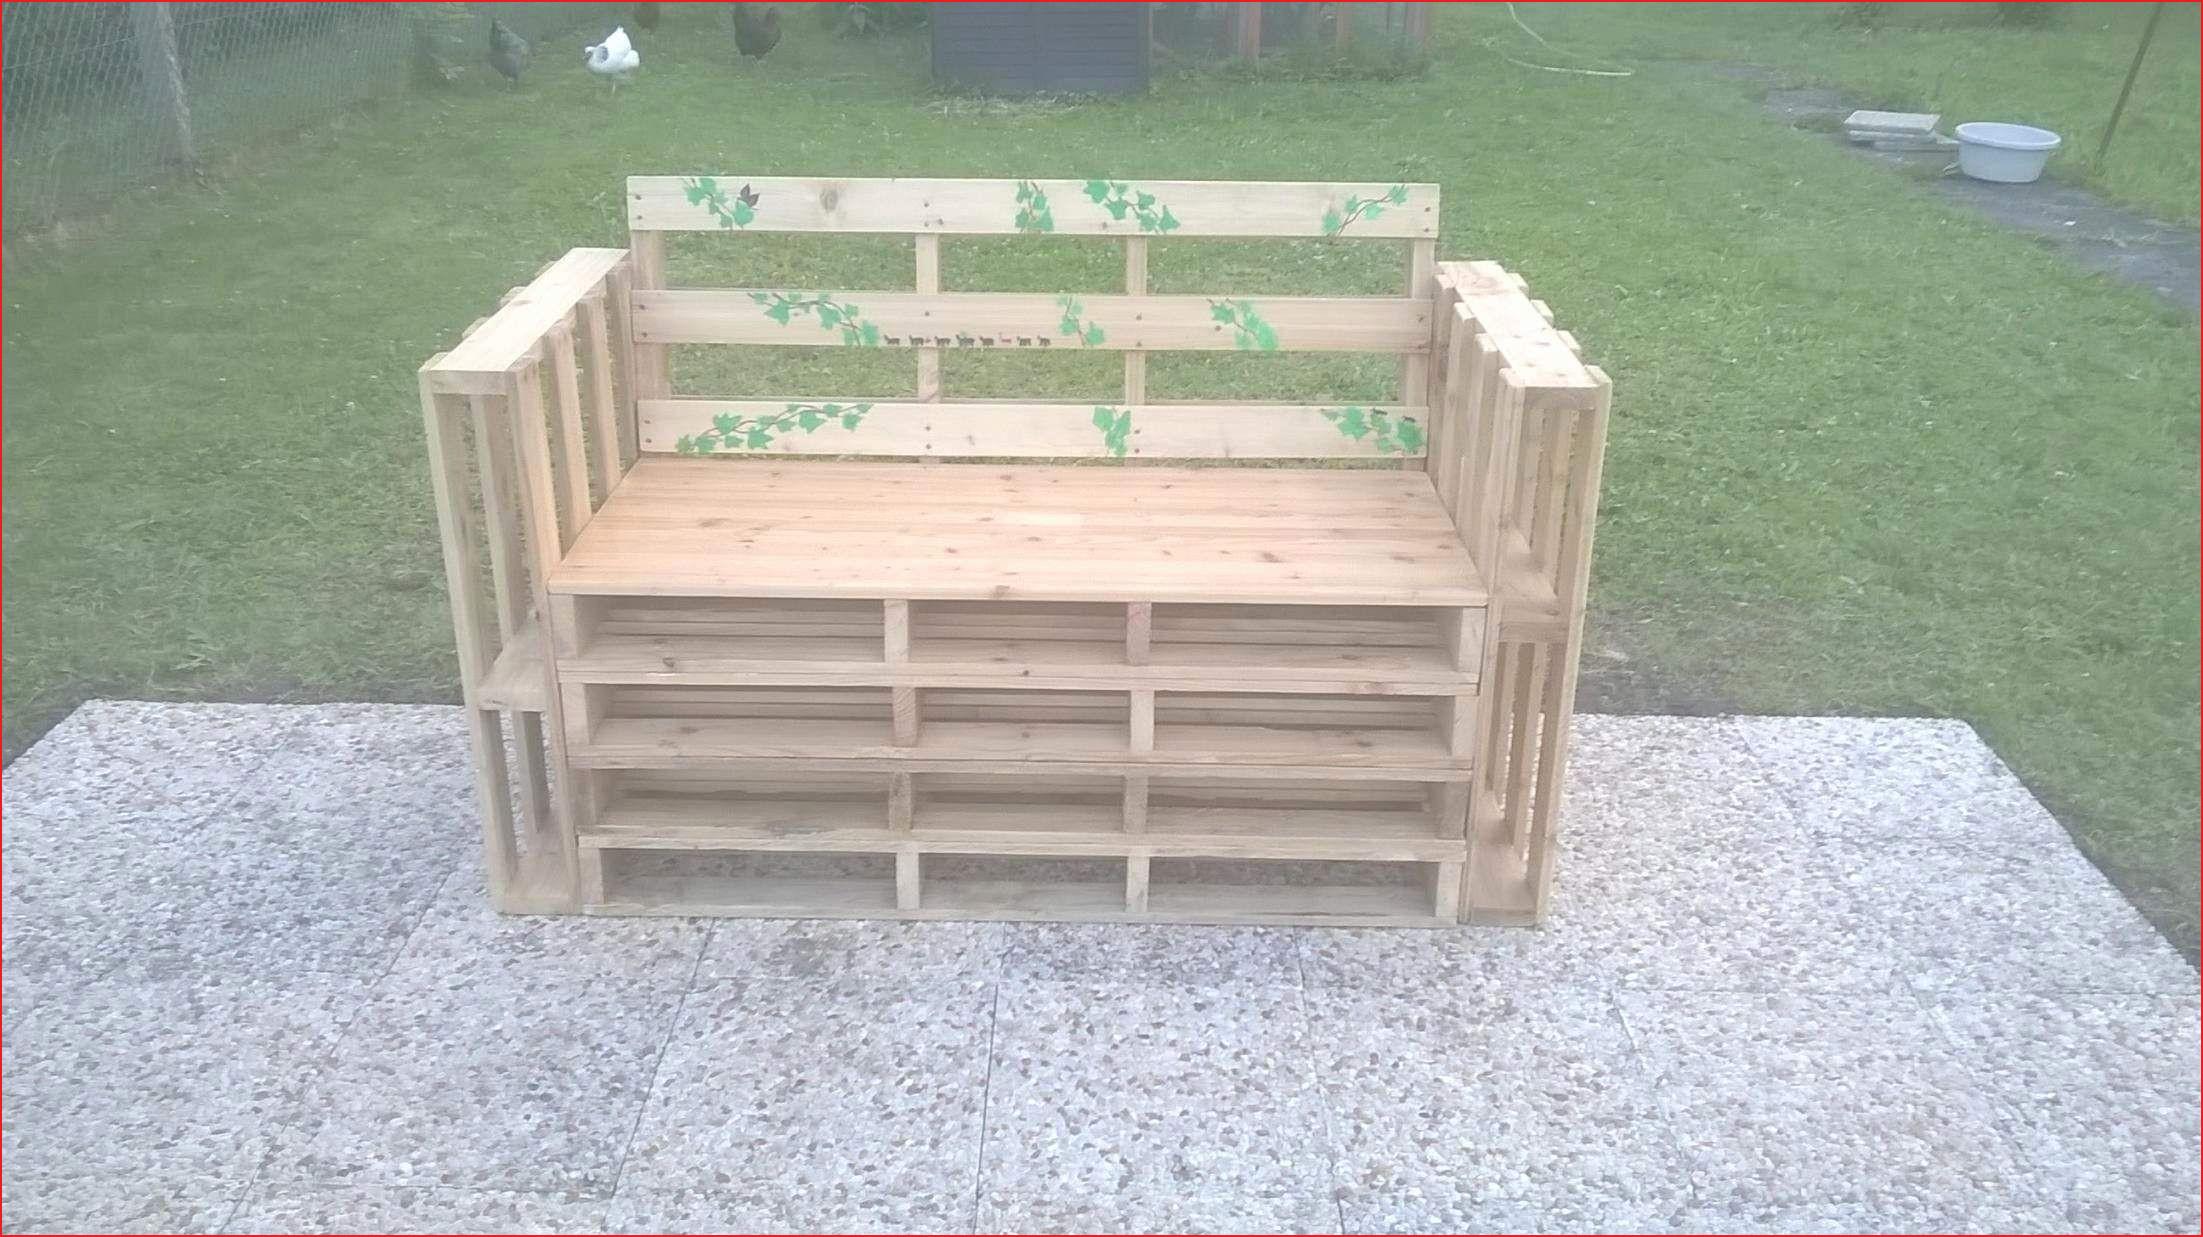 Chaise Jardin Teck Inspirant Innovante Banc Pour Jardin Image De Jardin Décoratif Of 40 Inspirant Chaise Jardin Teck